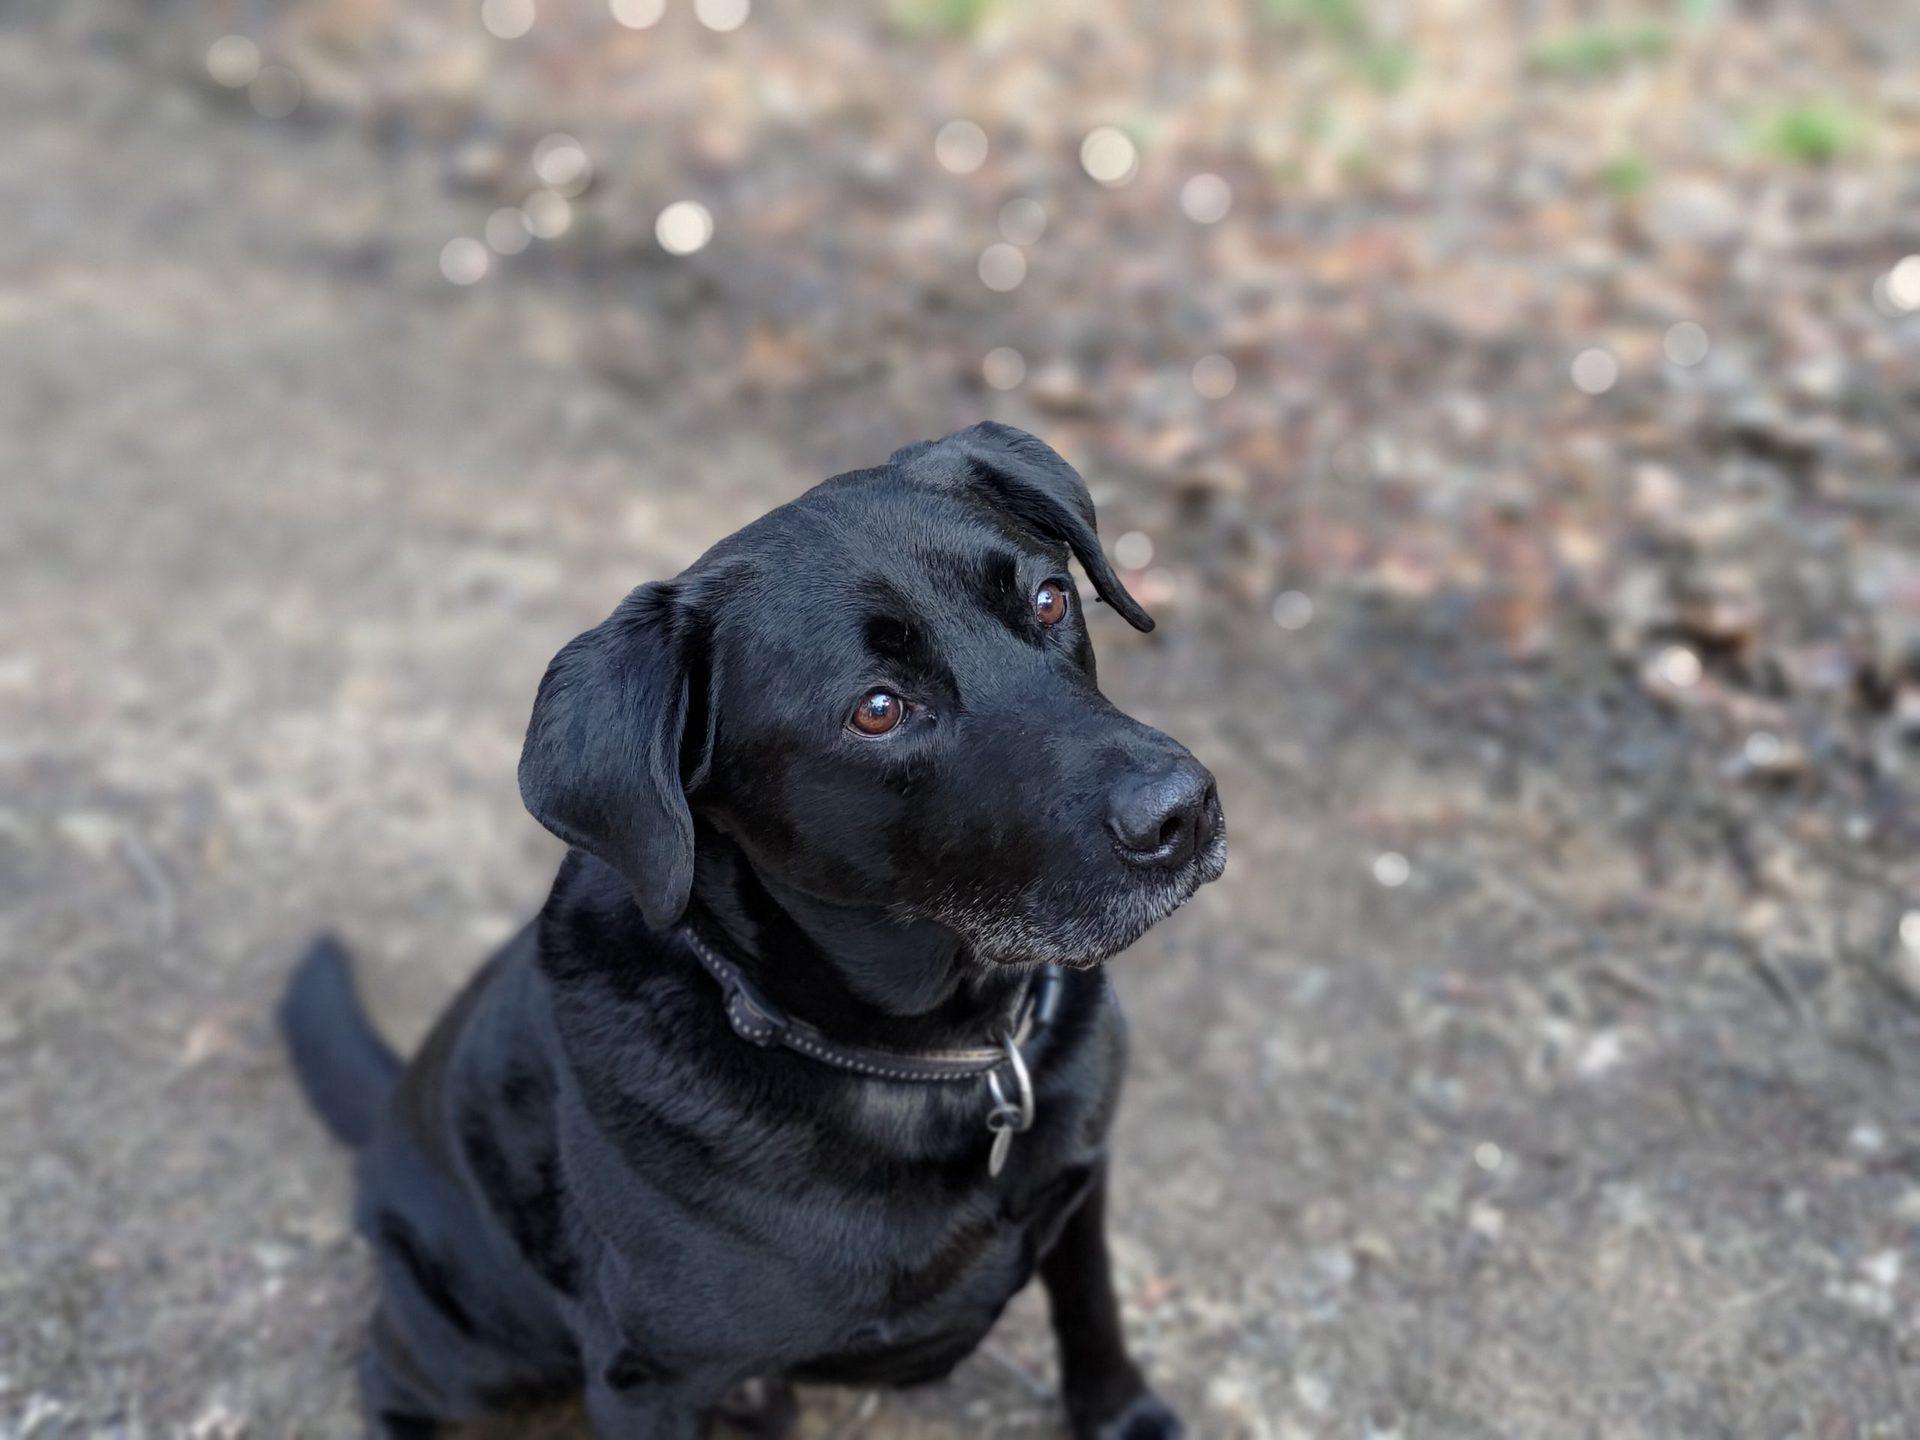 ROG Phone 5 portrait camera sample of a happy dog